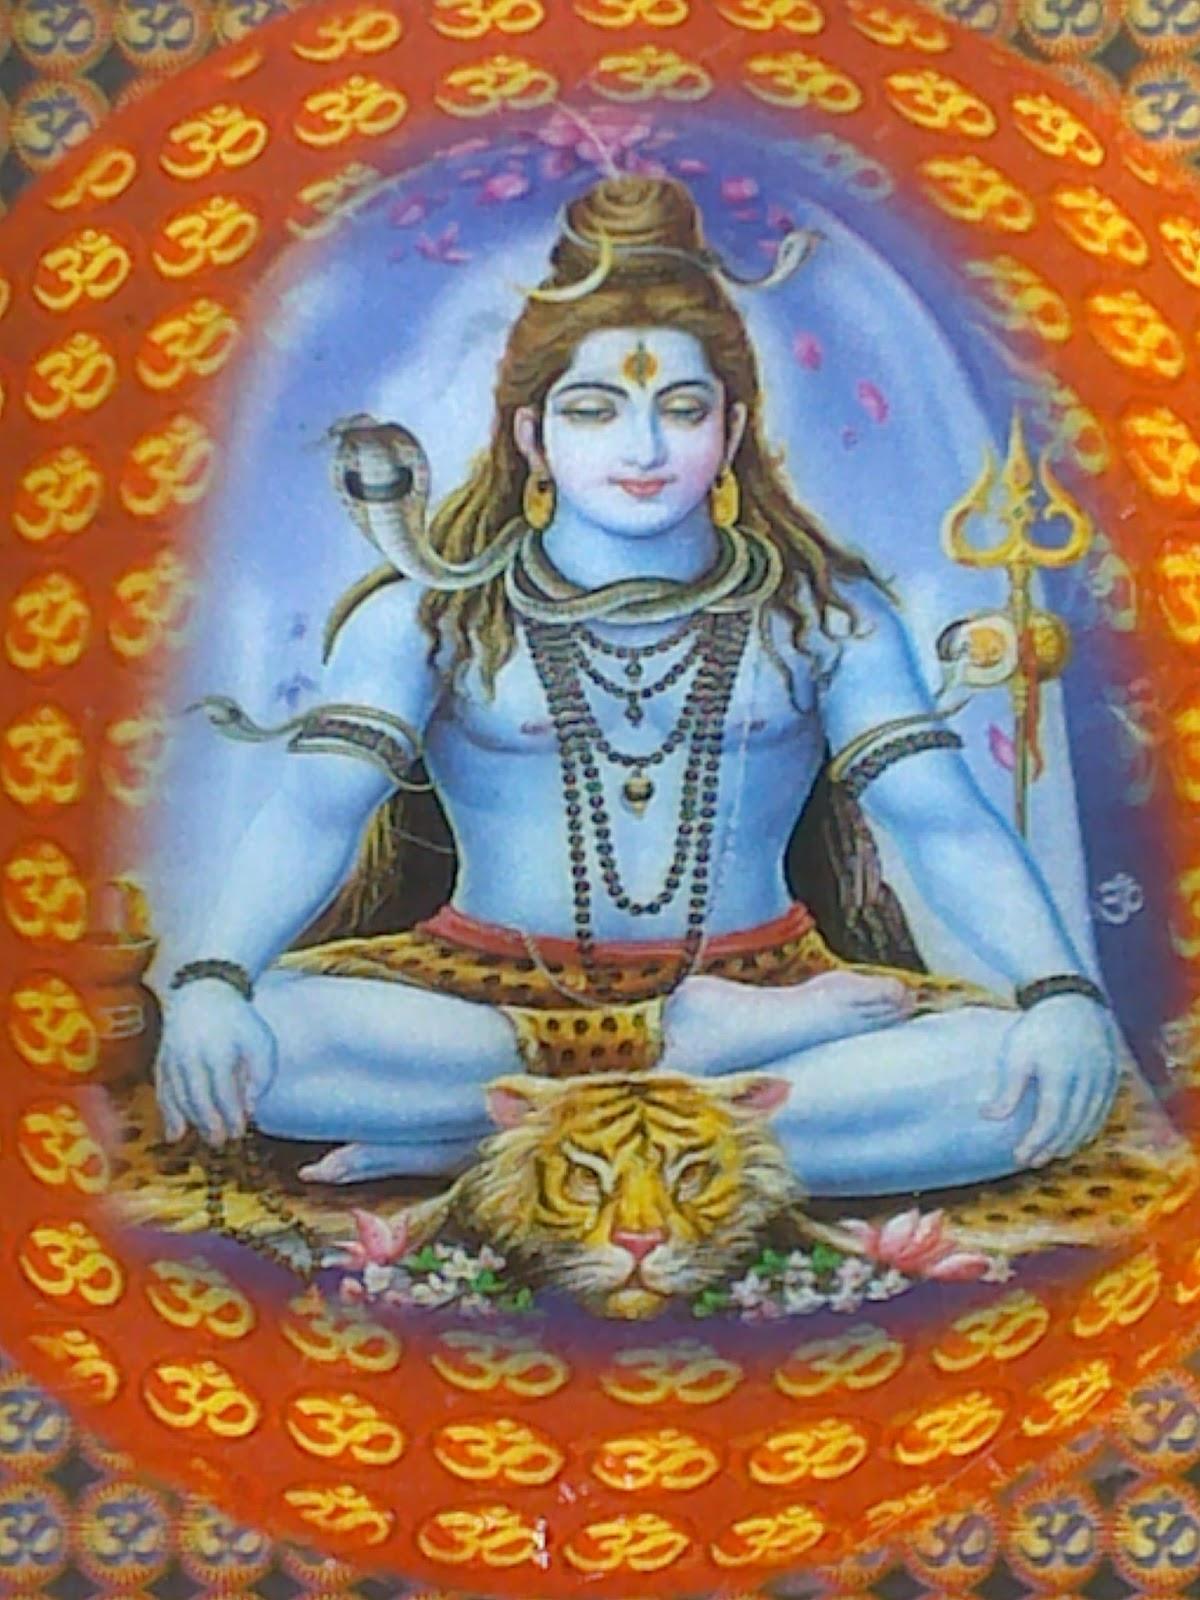 M S Subbulakshmi Vishnu Sahasranamam Download